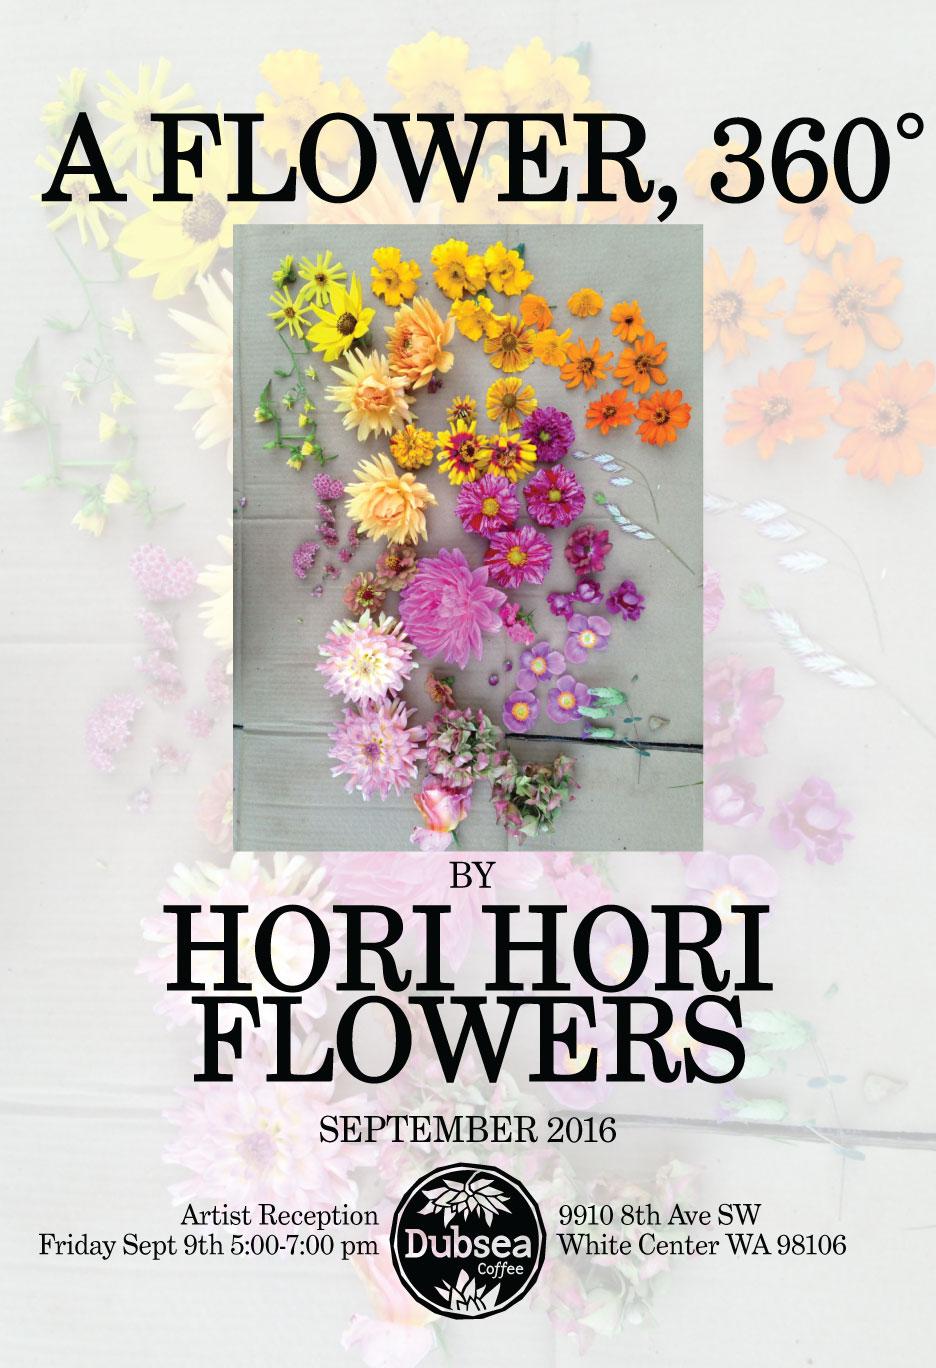 HoriHoriFlowersPoster.jpg